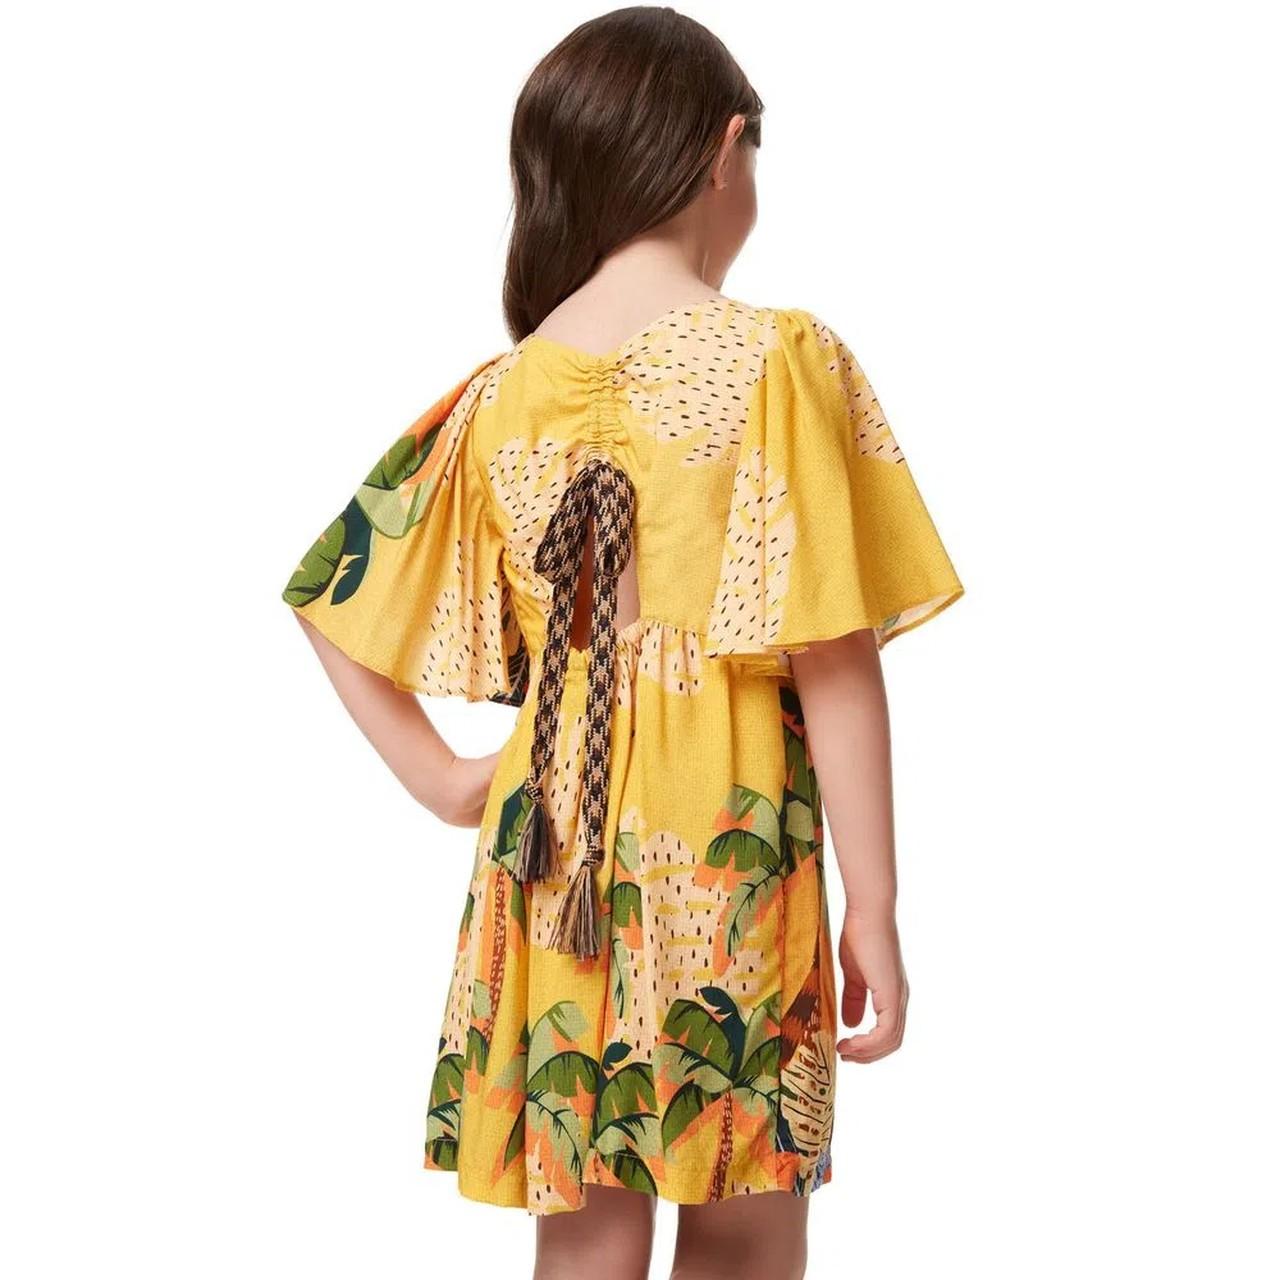 Vestido Curto Tucanos Amarelo Camu Camu